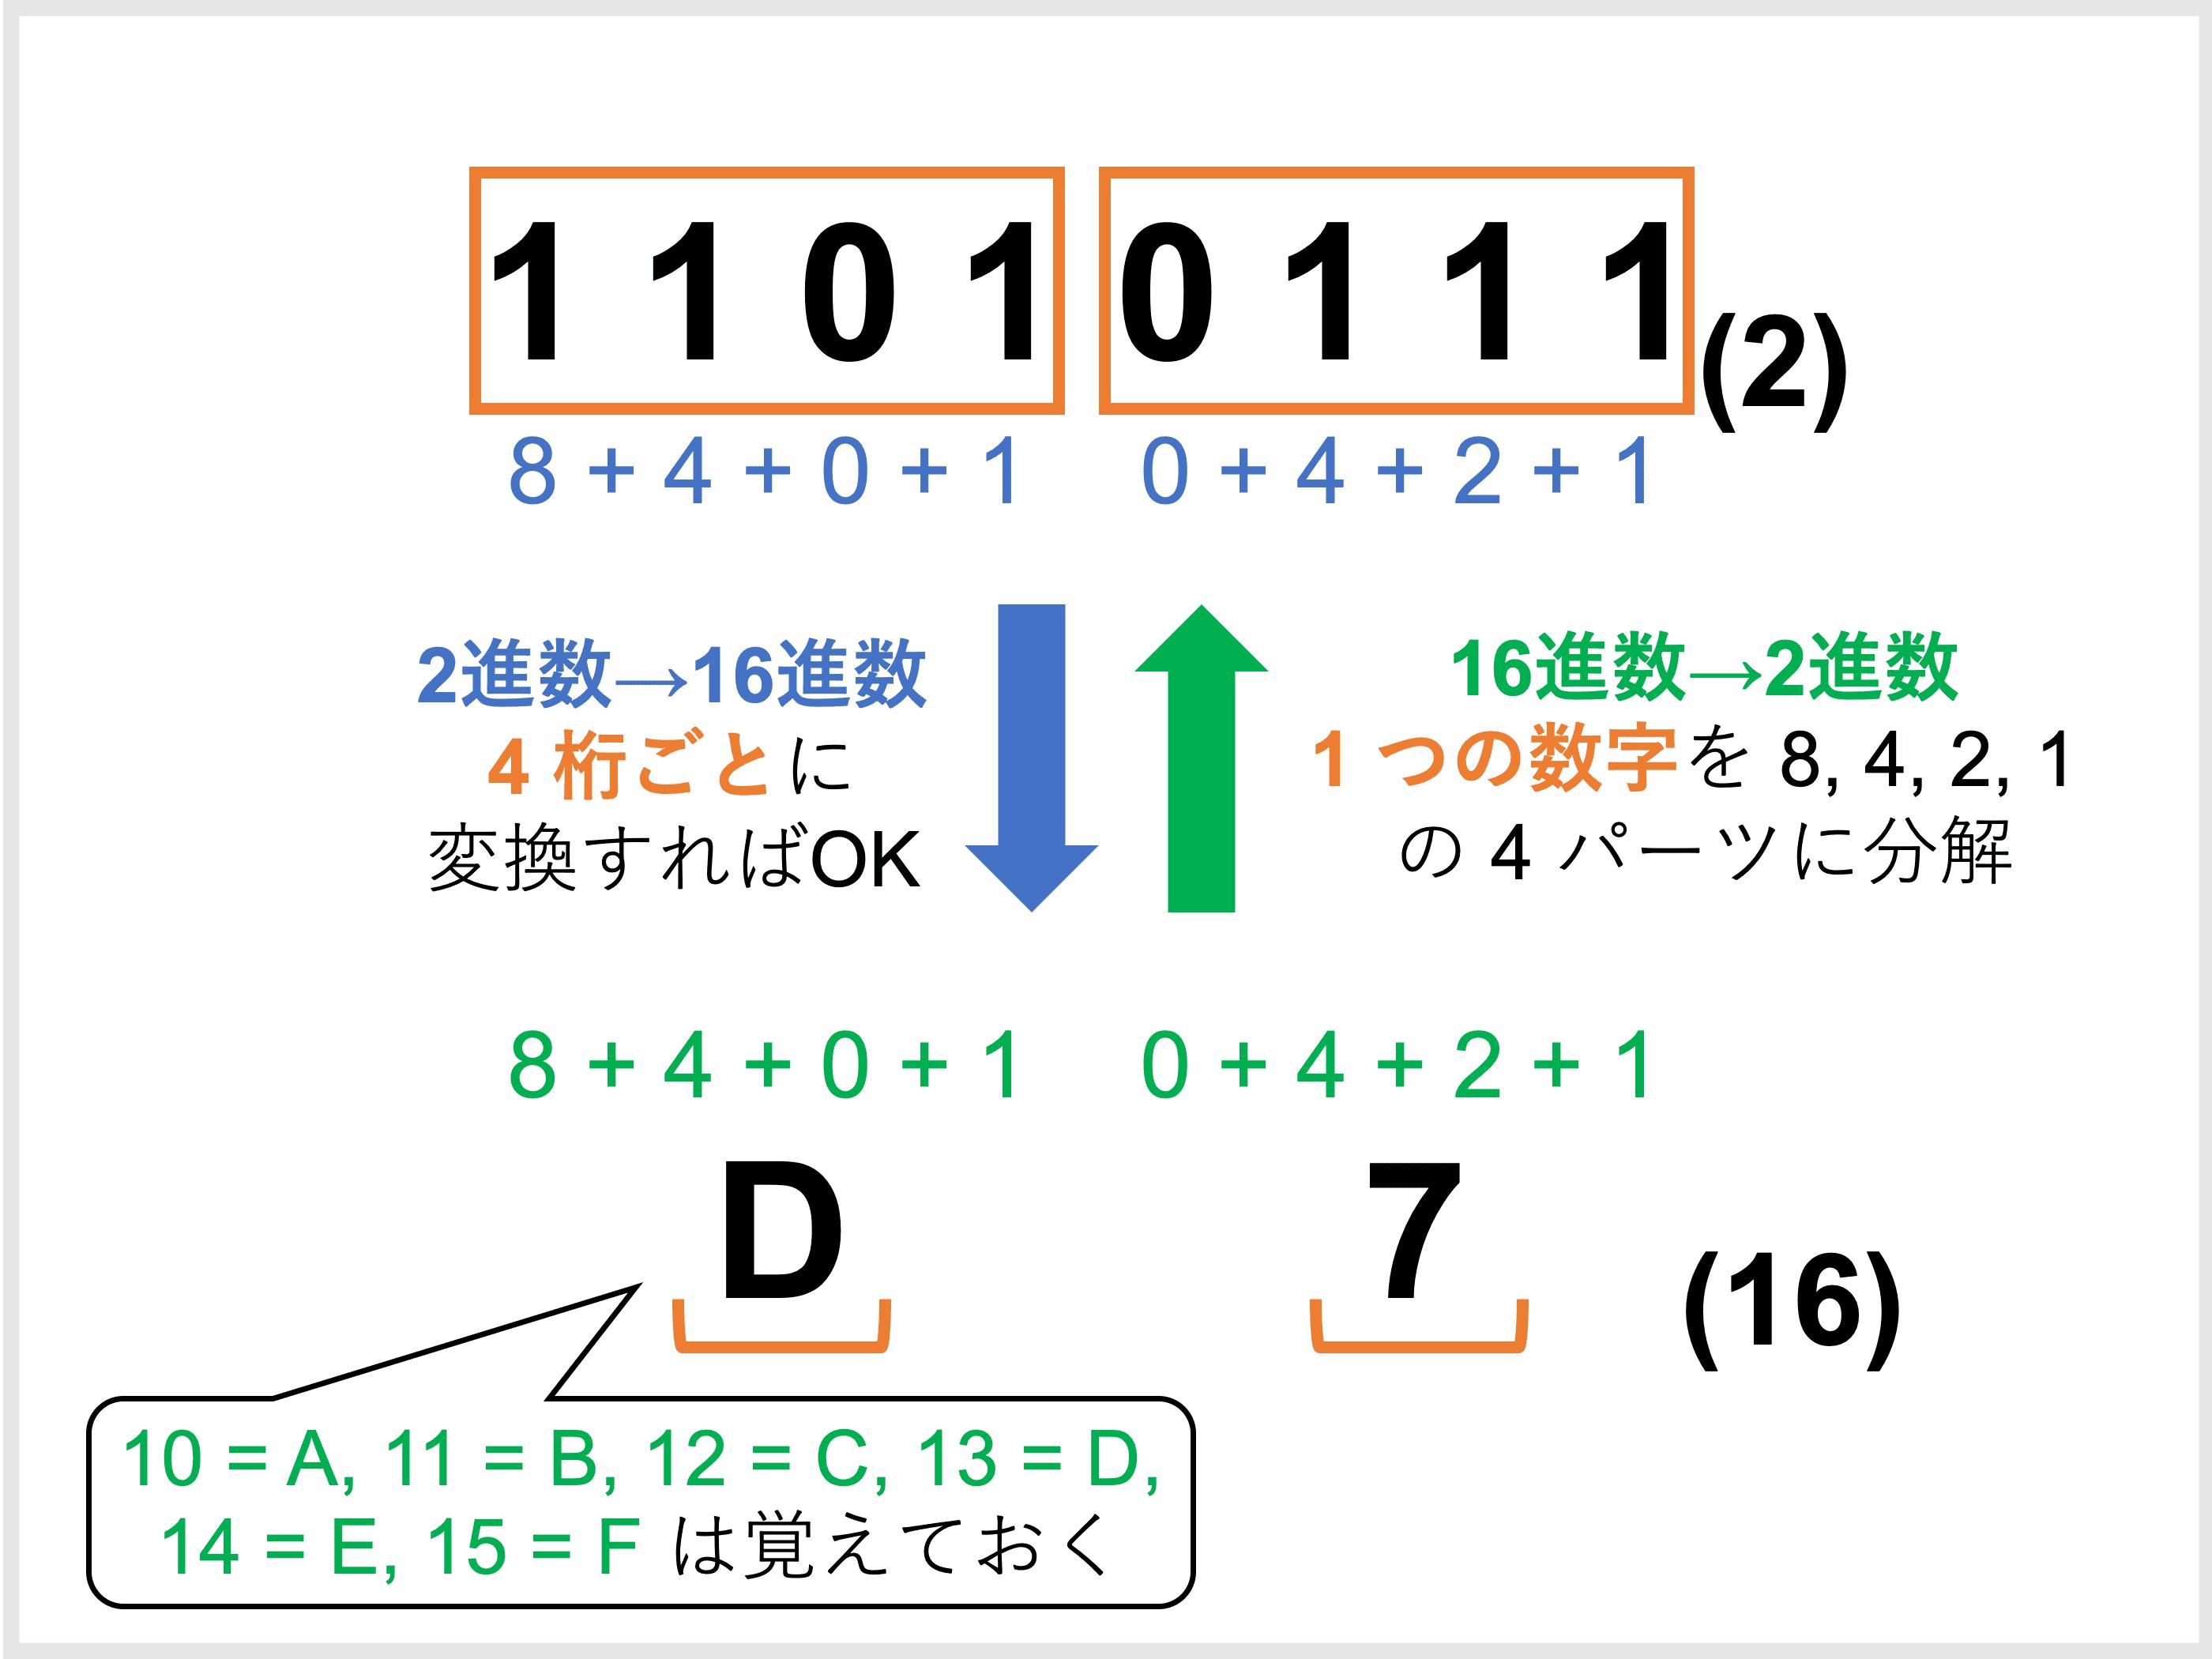 n 進法とは?変換方法(10進法・60進法・2進法・16進法)や計算問題をわかりやすく解説!